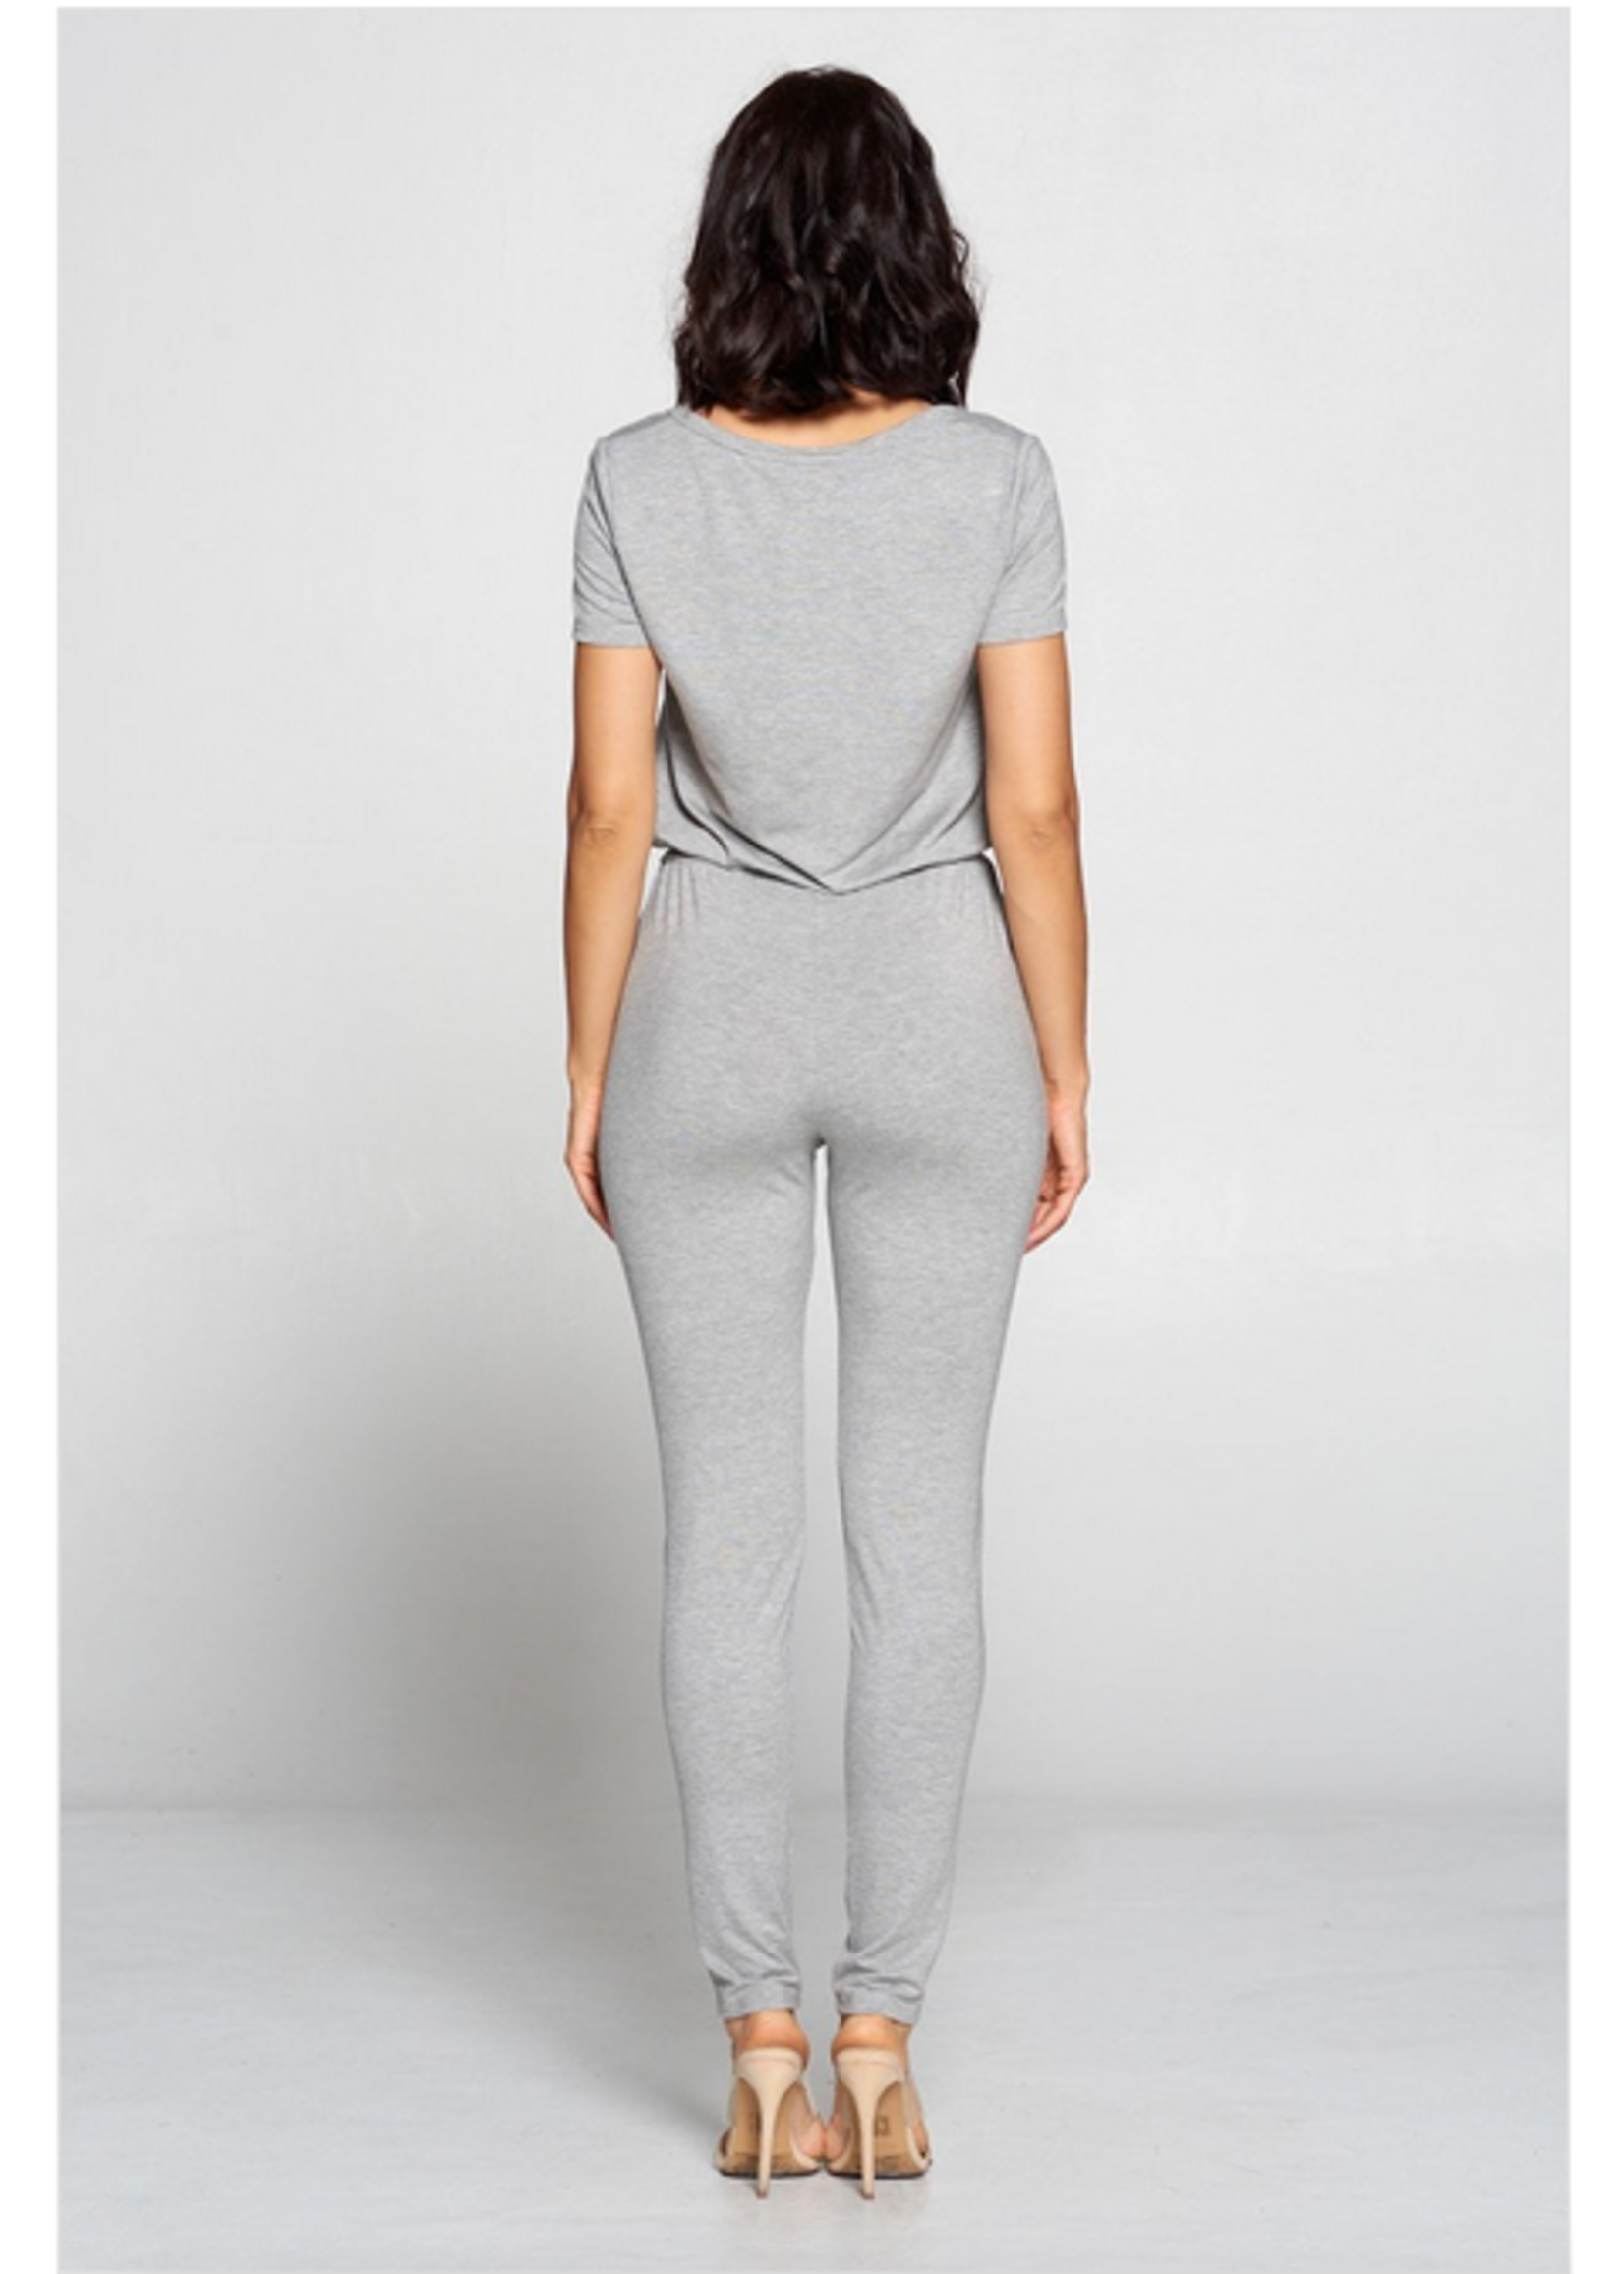 Win Win Jaida Jumpsuit Grey